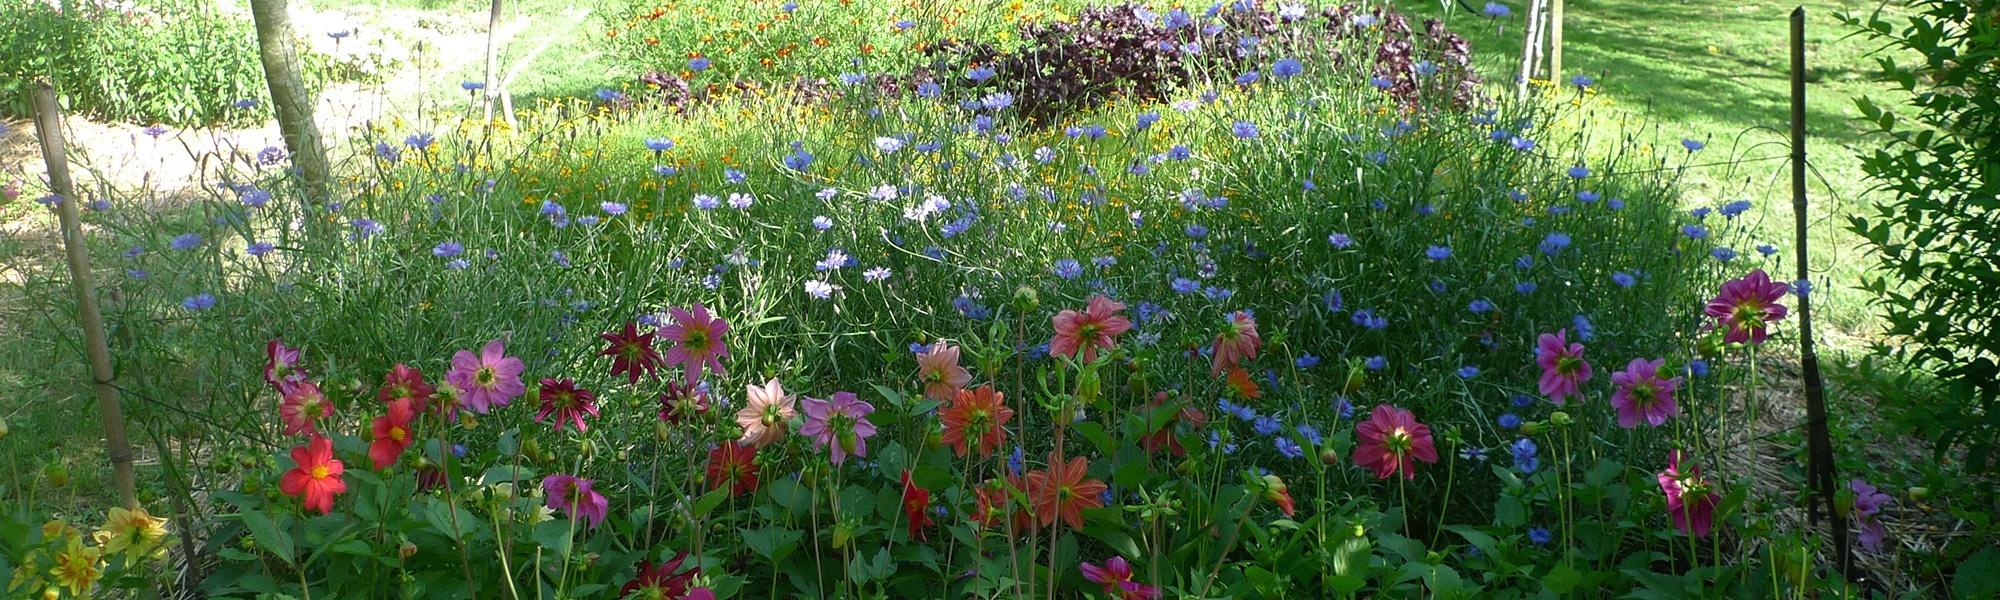 Broutilles Poitiers Jardin